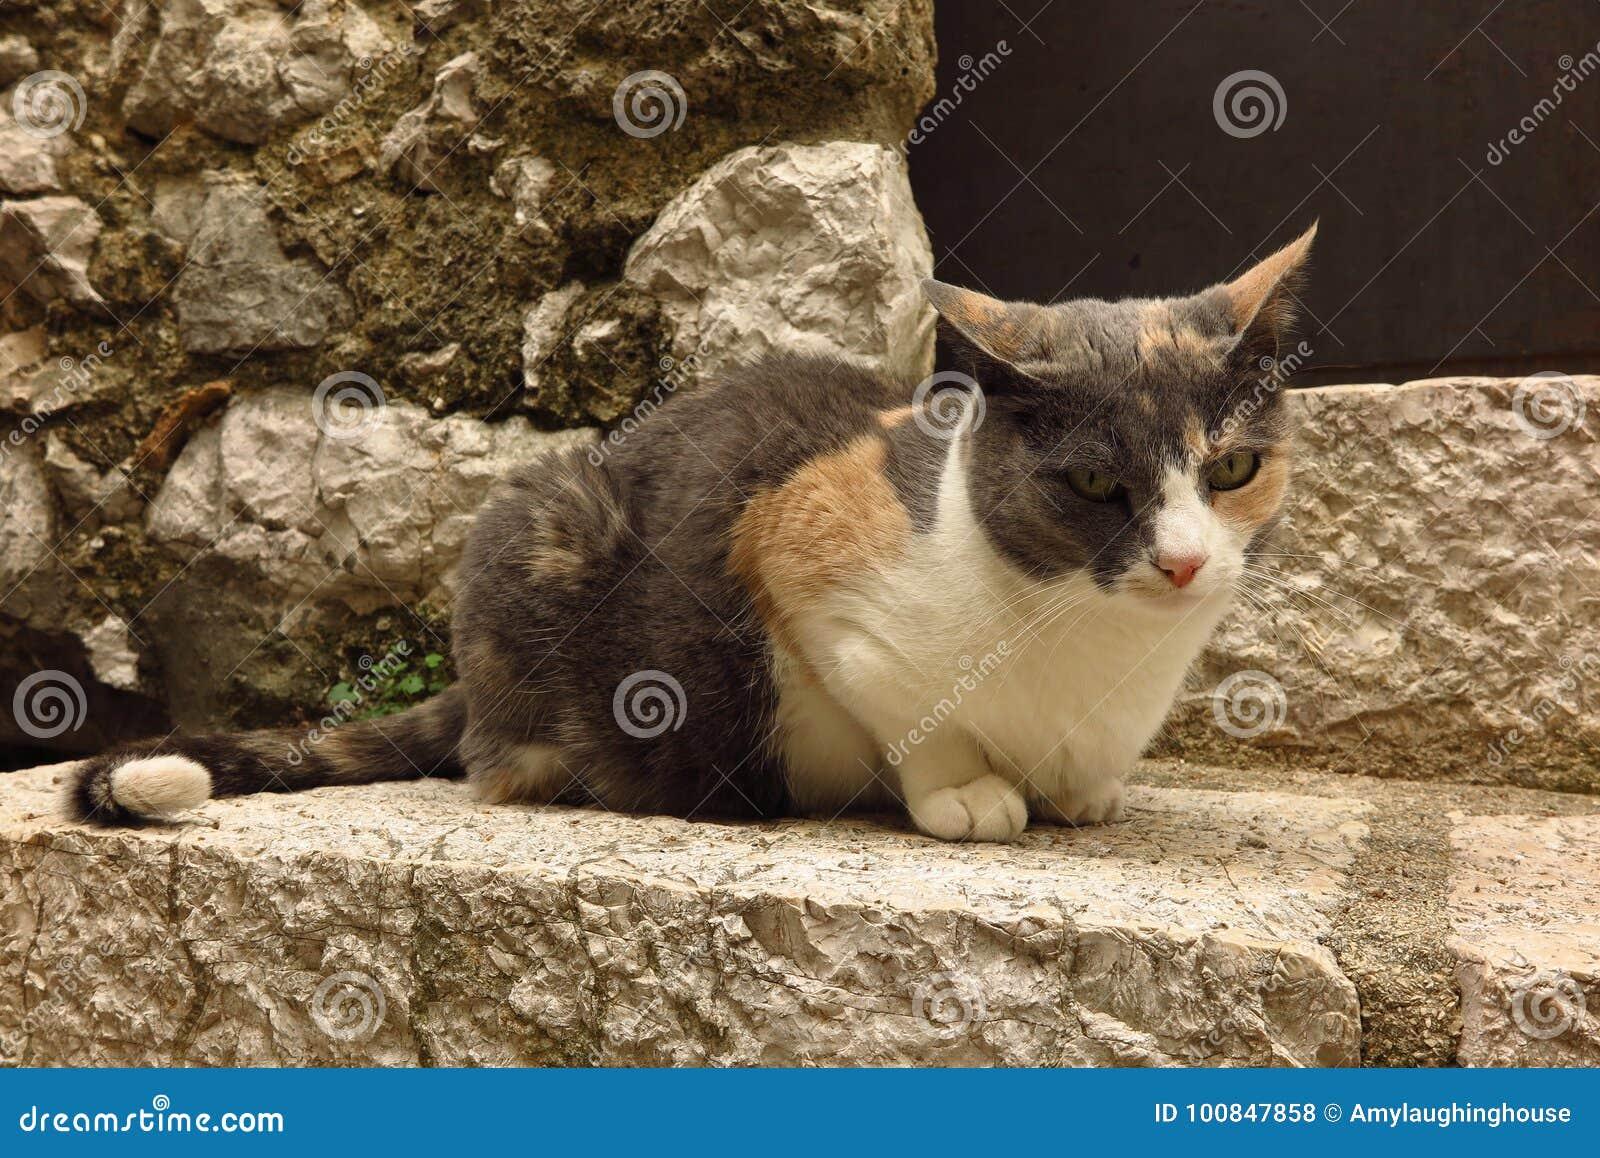 Calico cat on stone step stock photo  Image of street - 100847858